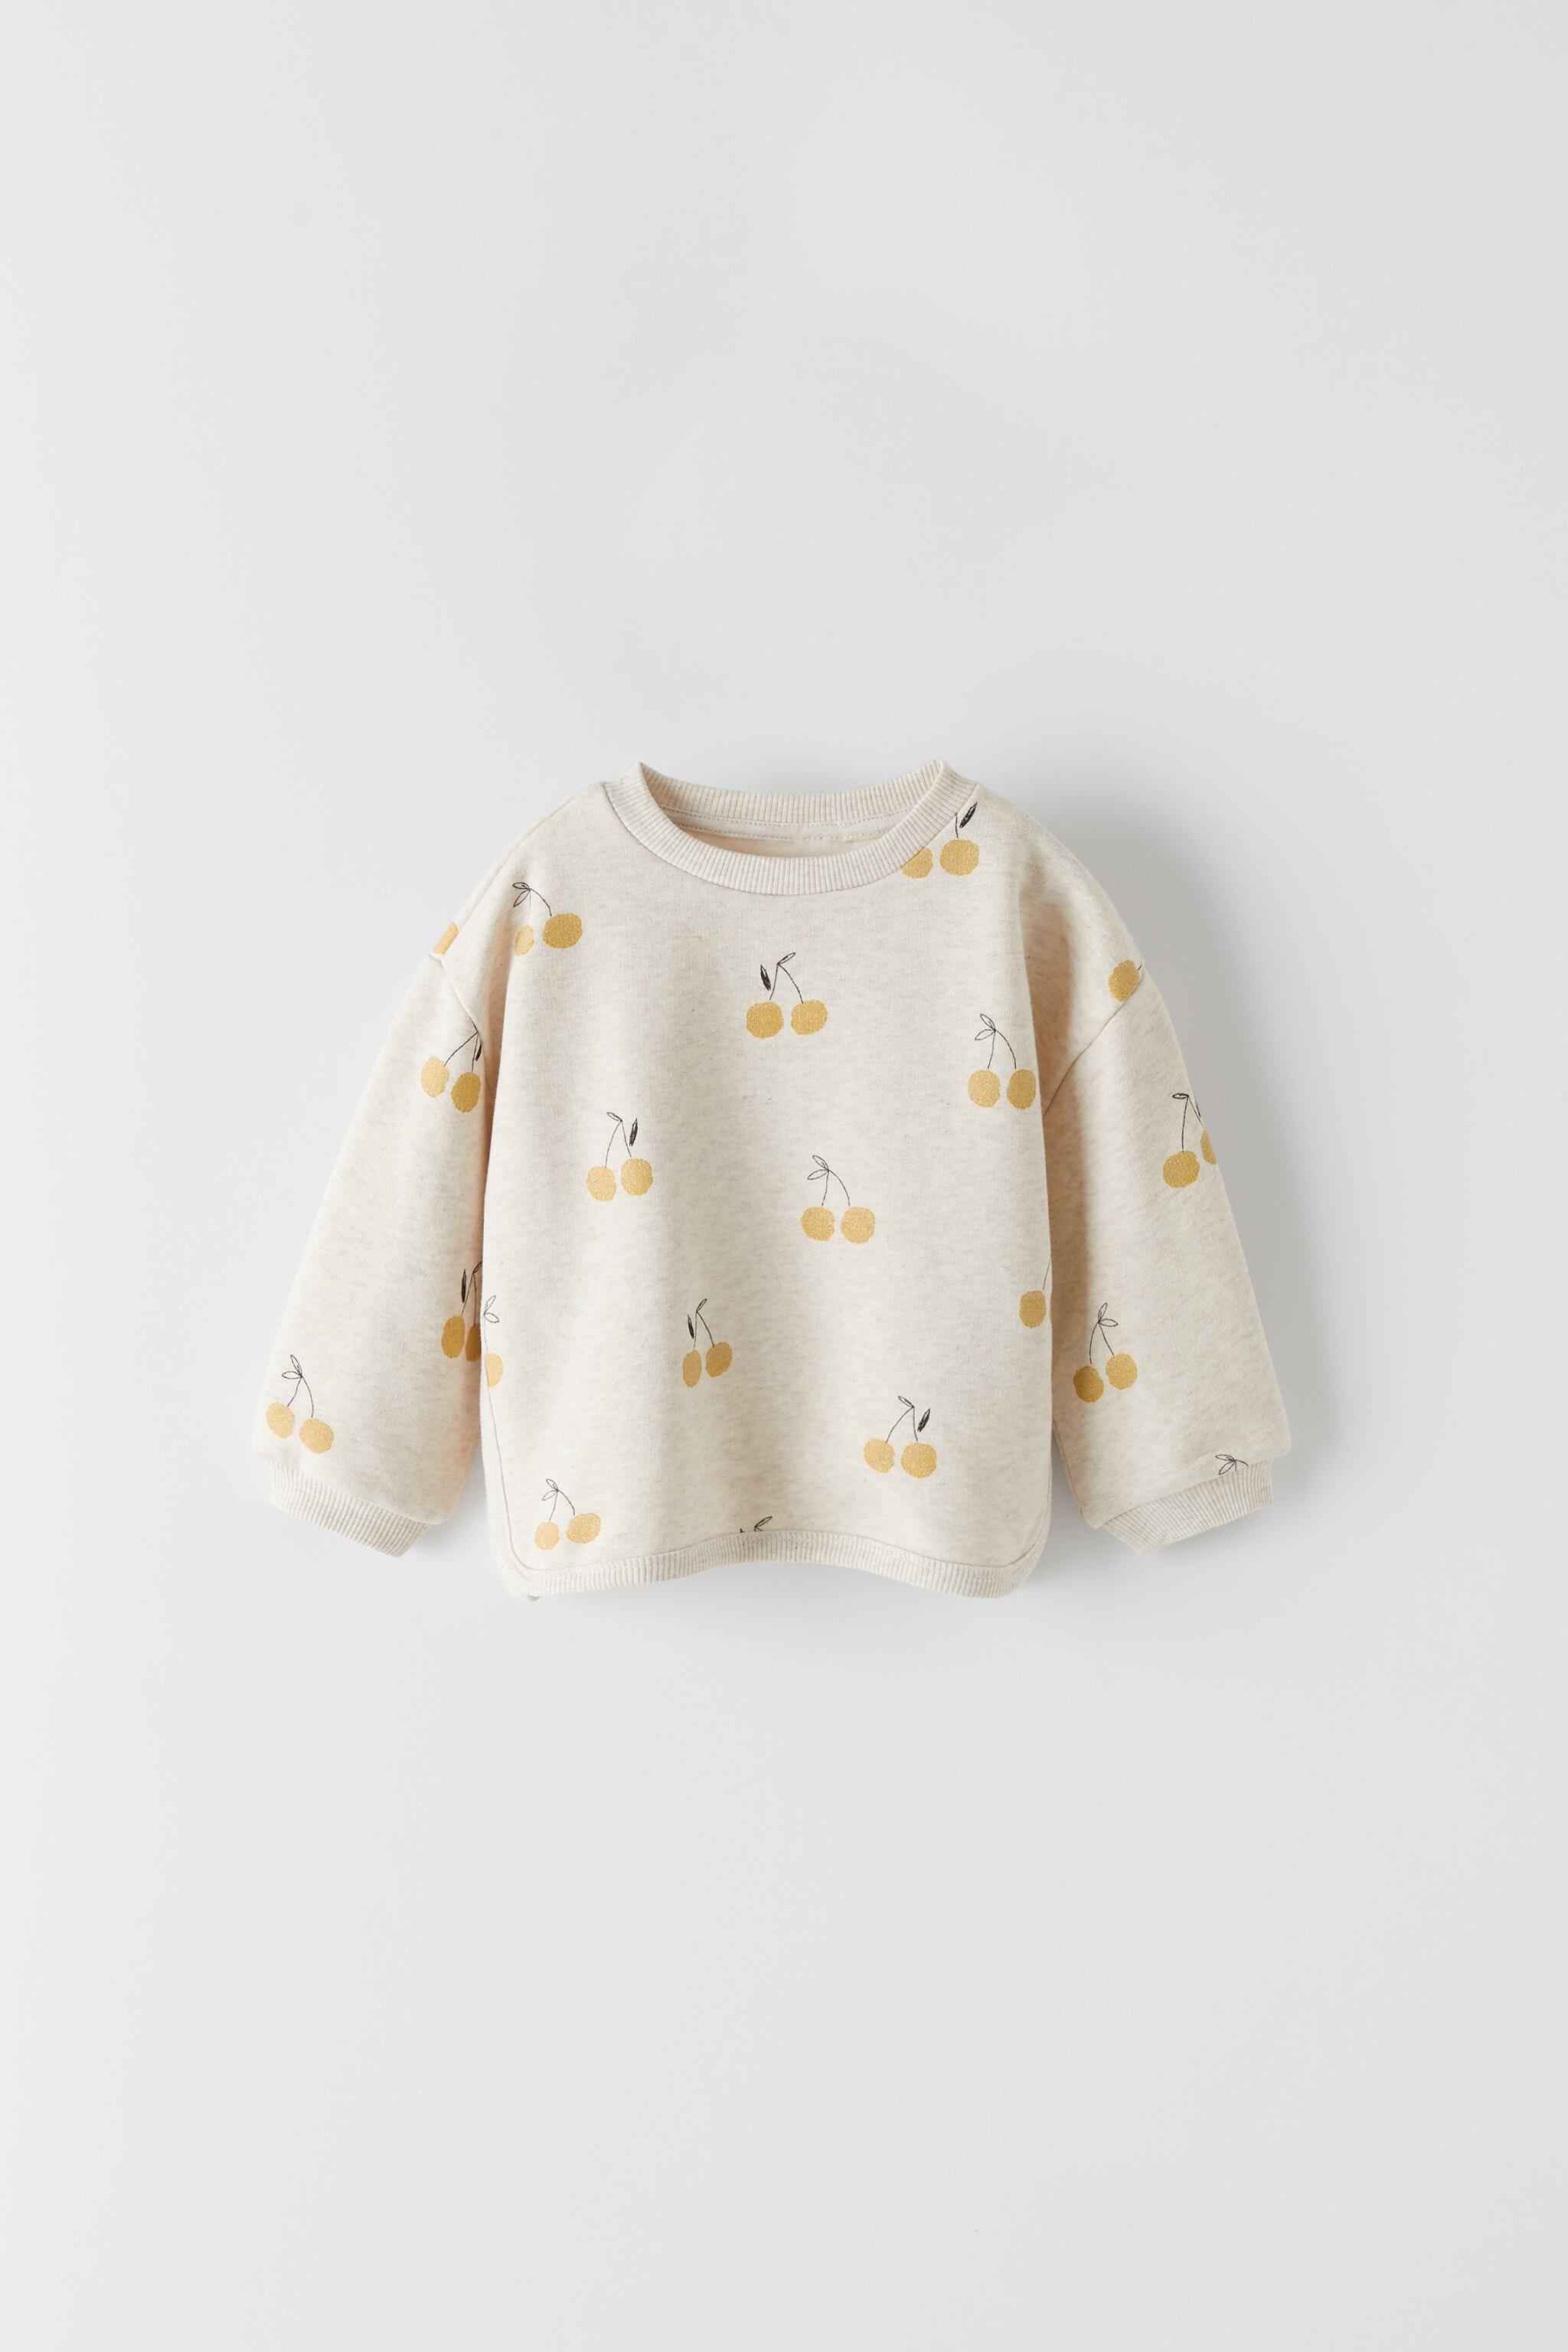 Cherry Sweatshirt Zara United Kingdom Baby Clothes Sizes Baby Girl Sweatshirt Hipster Baby Clothes [ 3072 x 2048 Pixel ]